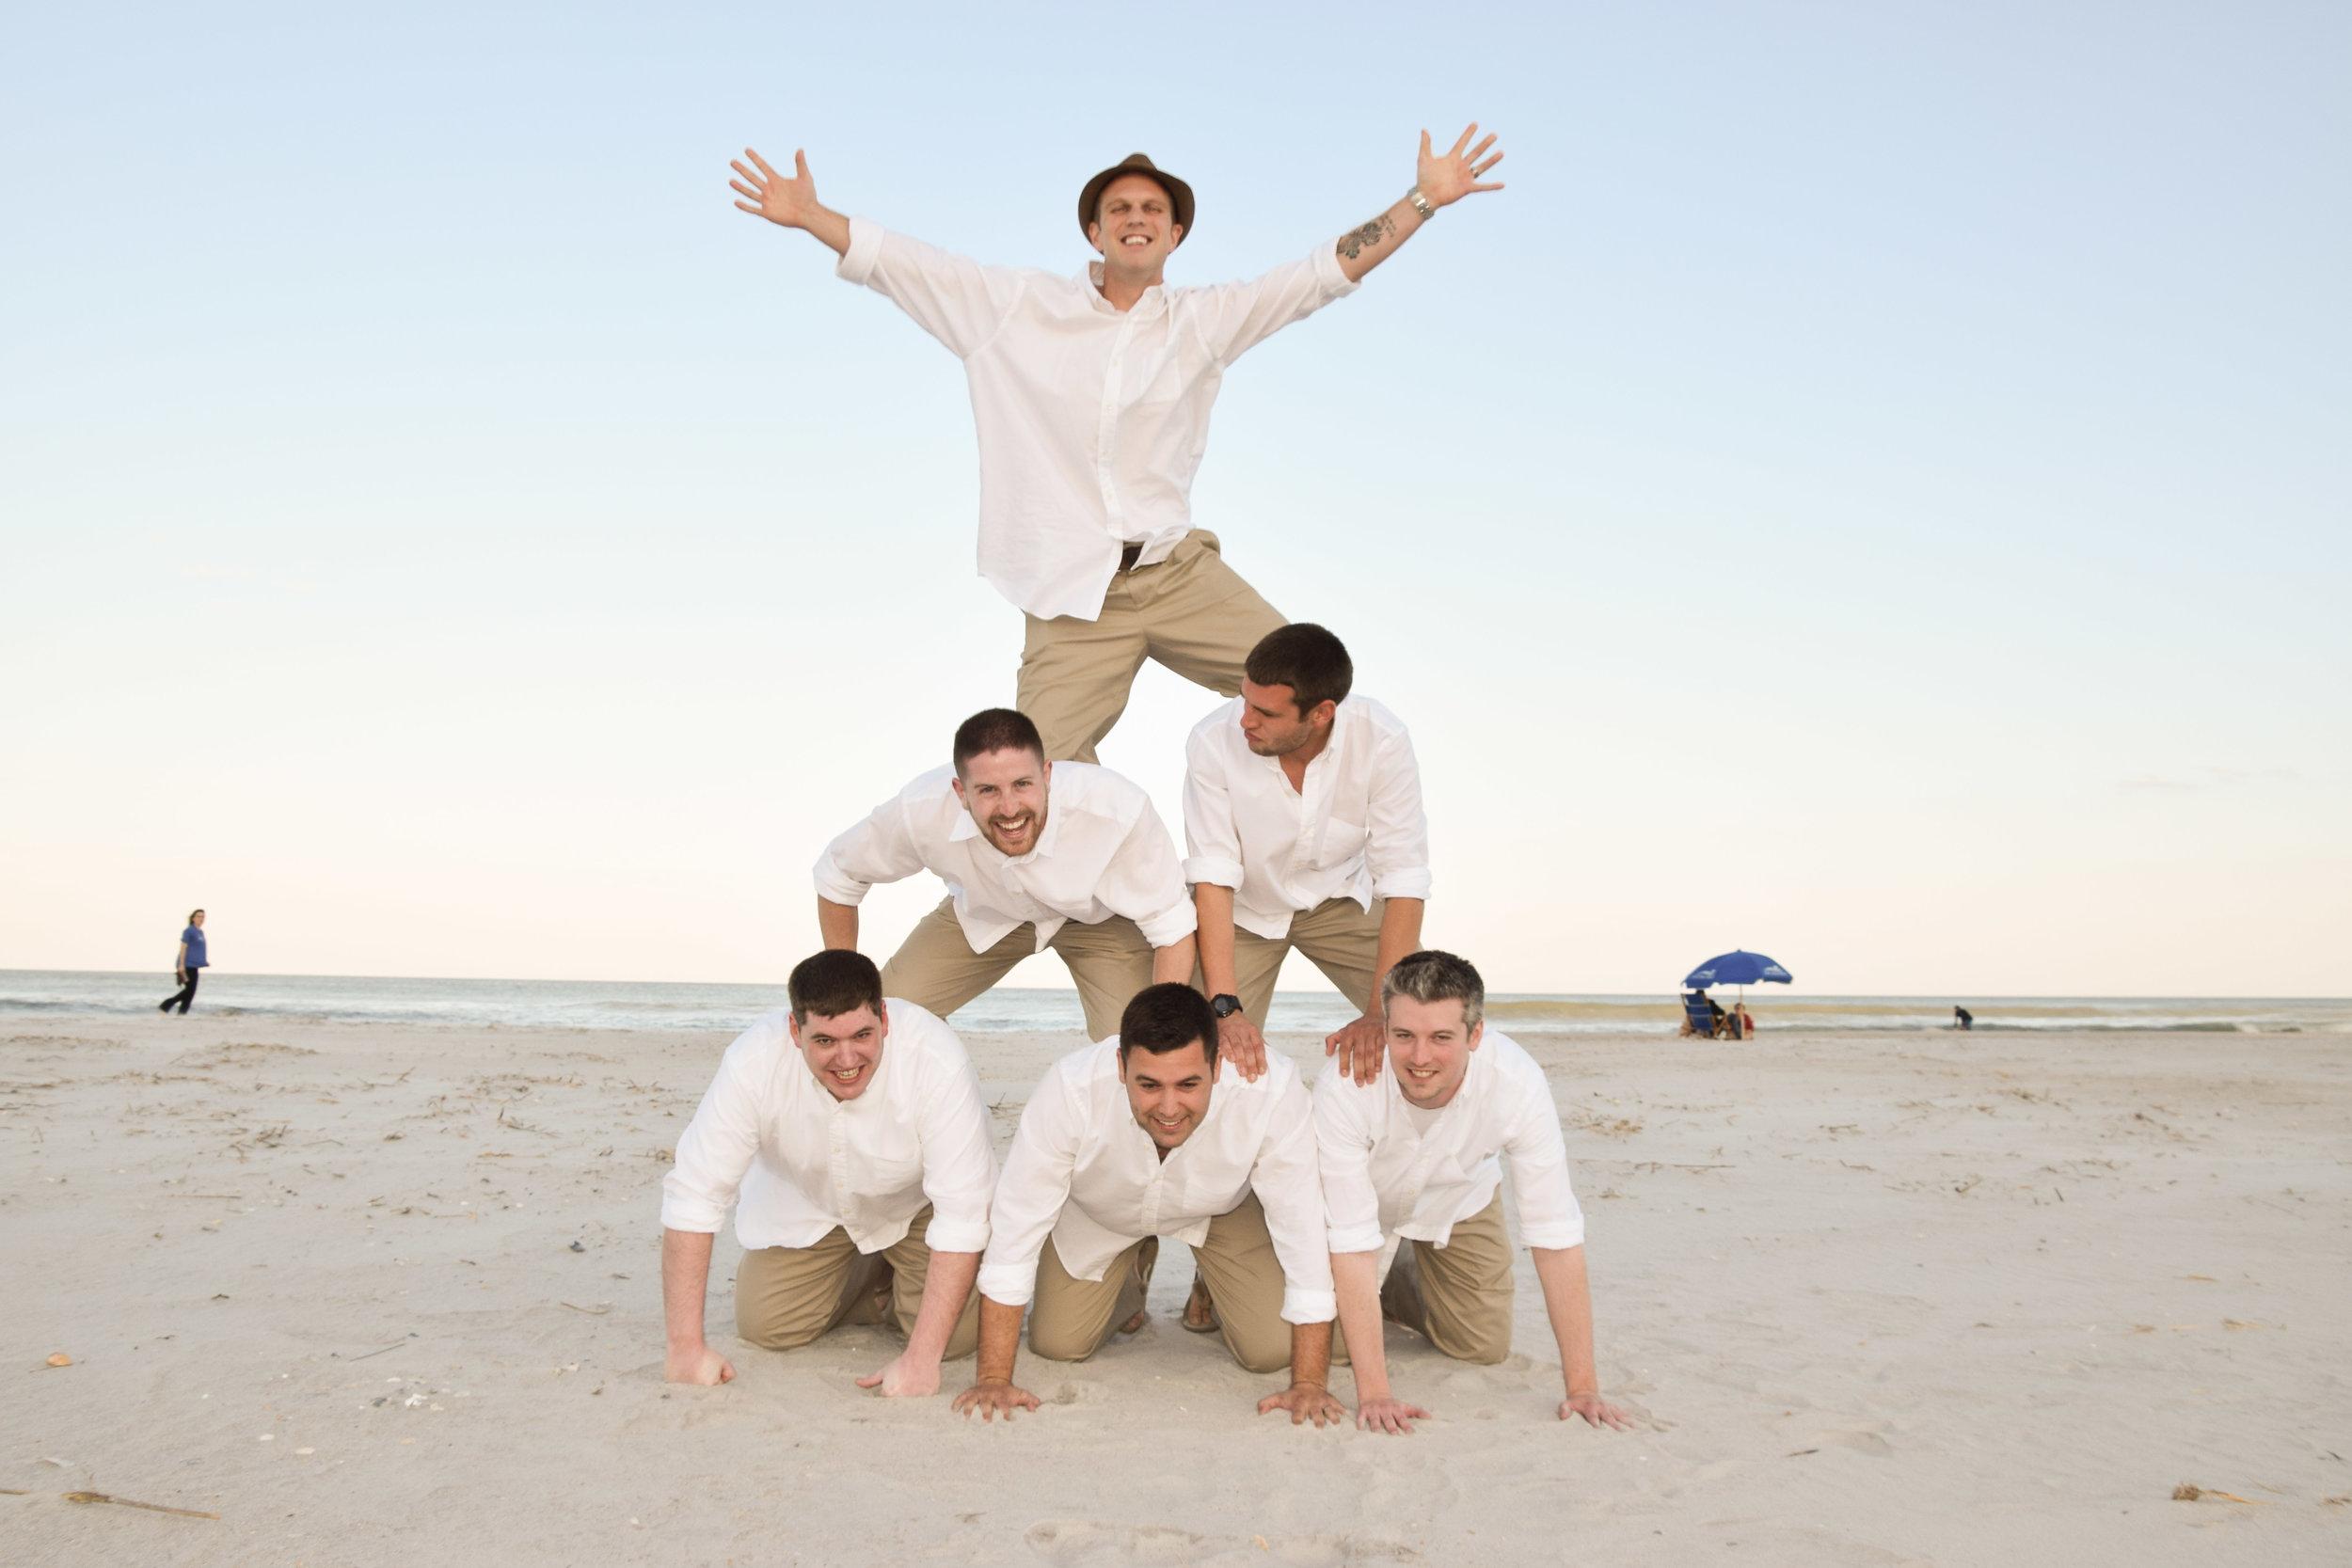 Groom and groomsmen make a pyramid on the beach.